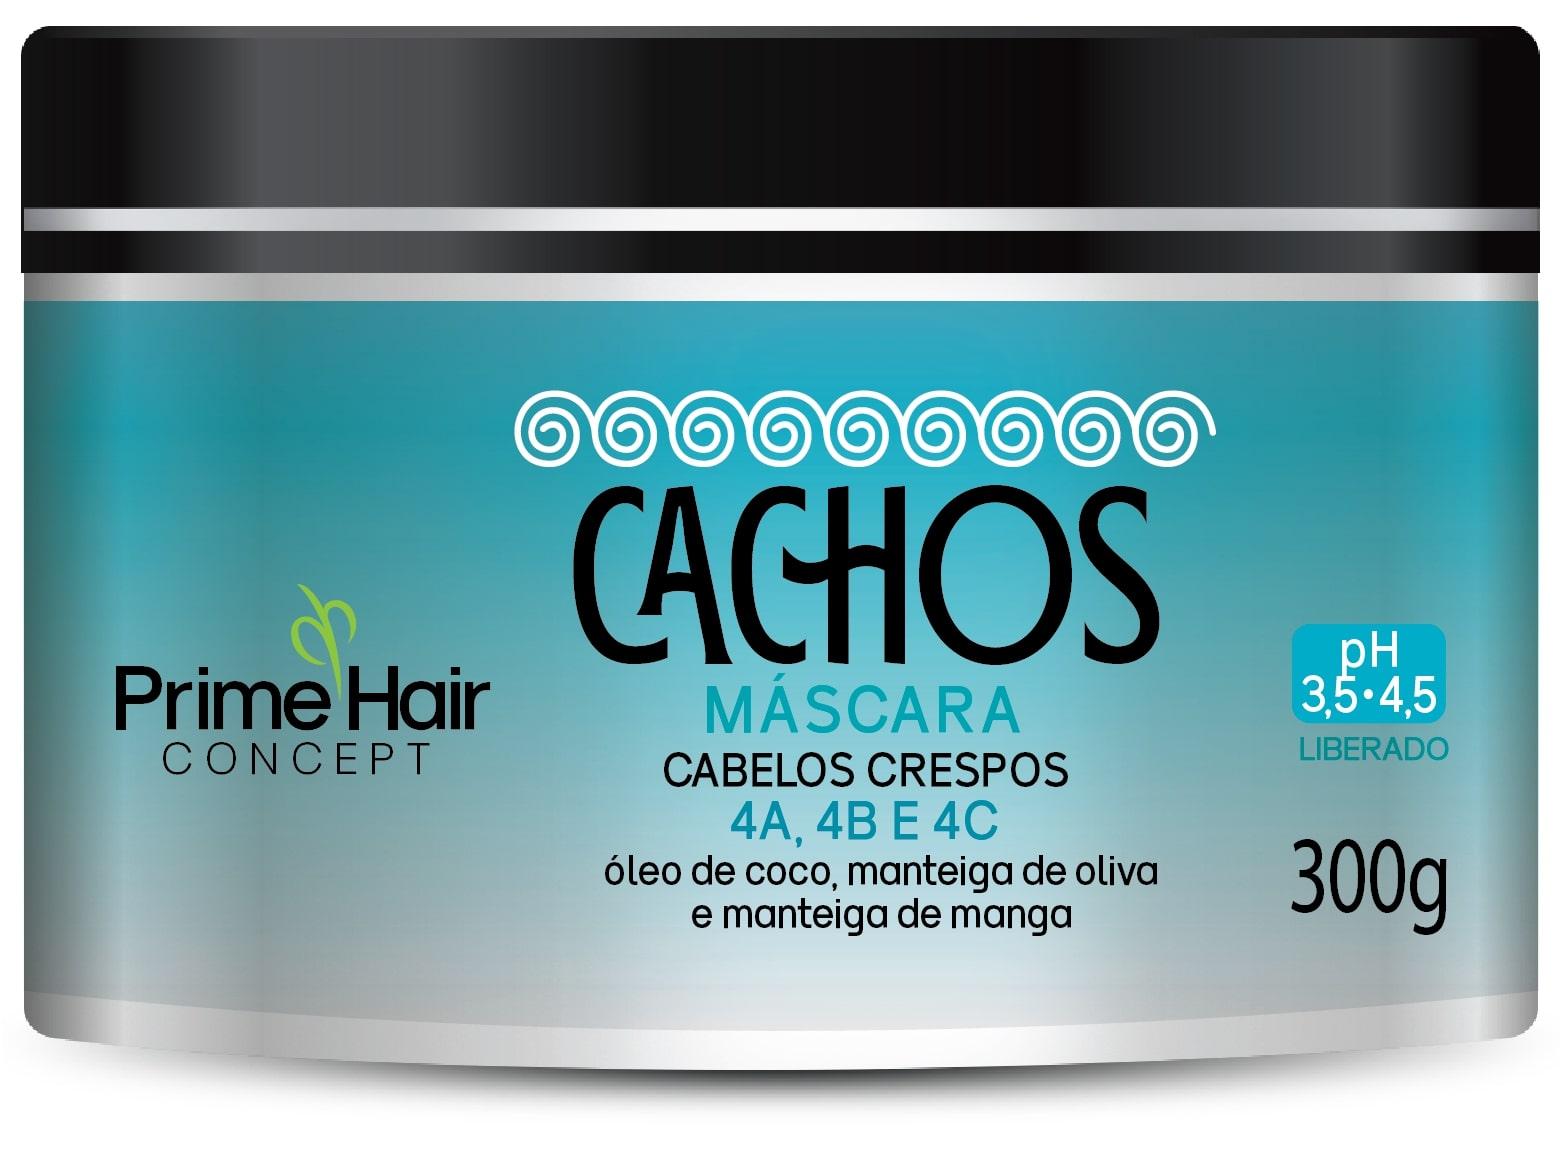 MASCARA PRIME HAIR 300G CACHOS-CACHOS CREPO